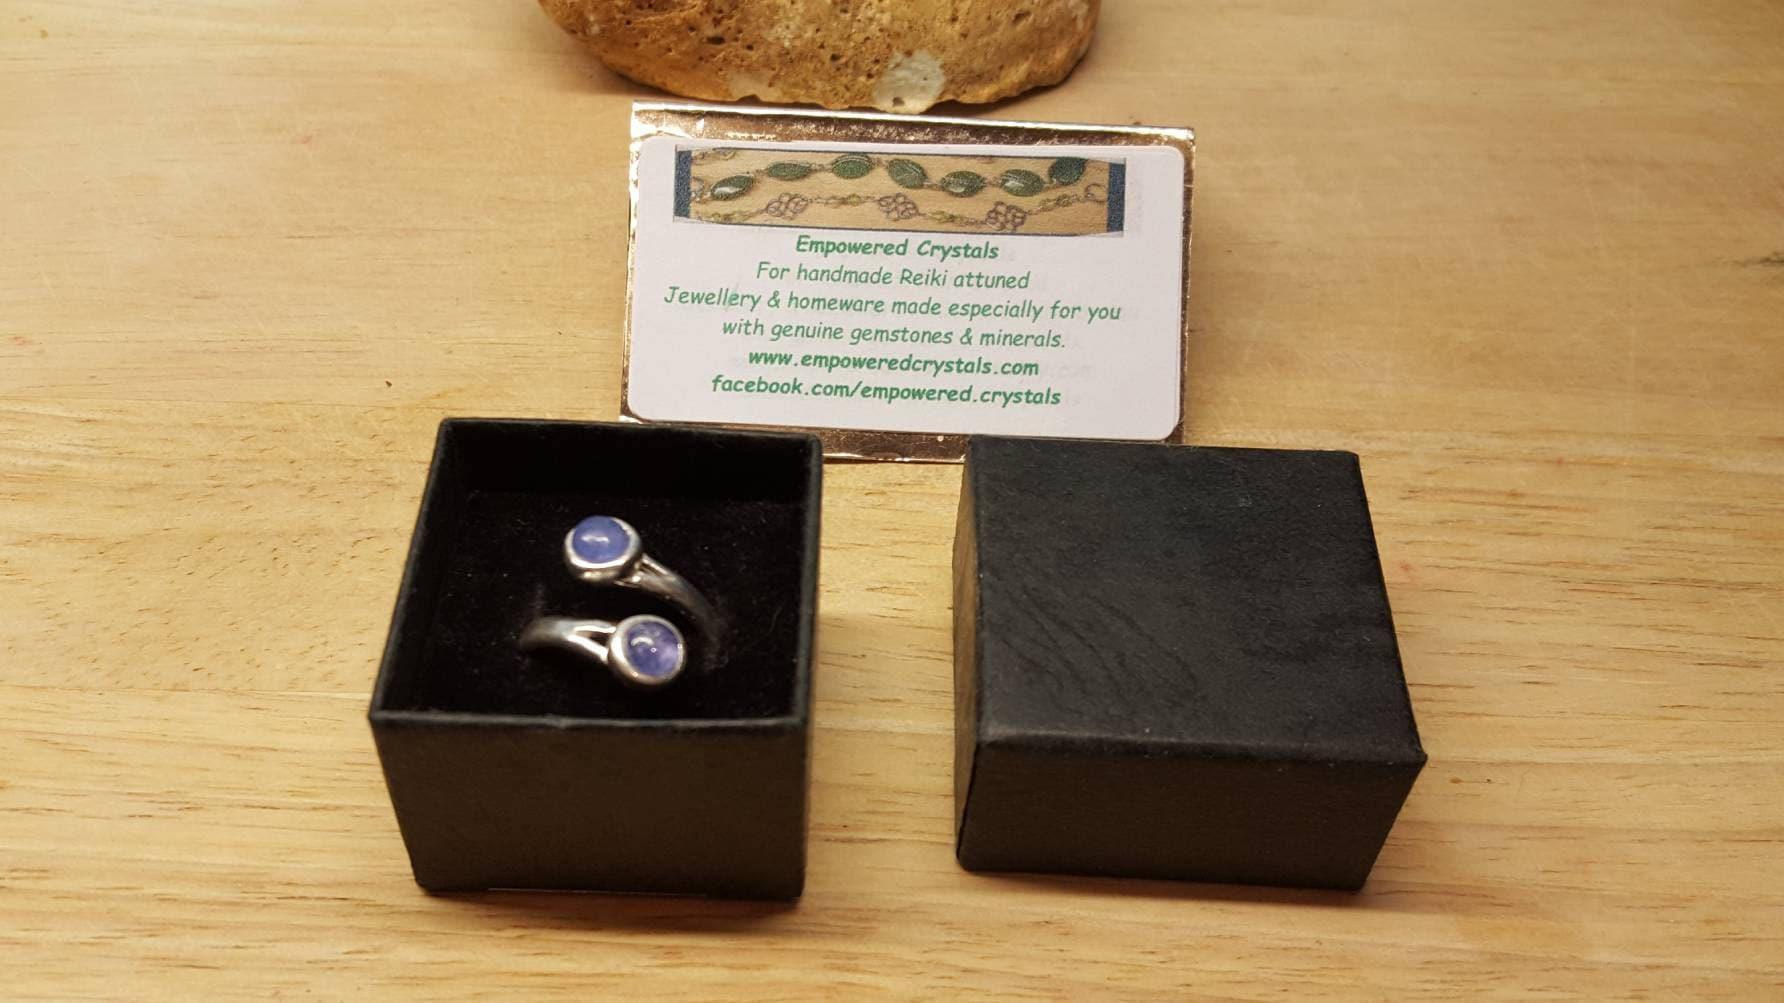 2 stone tanzanite ring 925 sterling silver reiki jewelry uk 2 stone tanzanite ring 925 sterling silver reiki jewelry uk violet flame adjustable buycottarizona Gallery